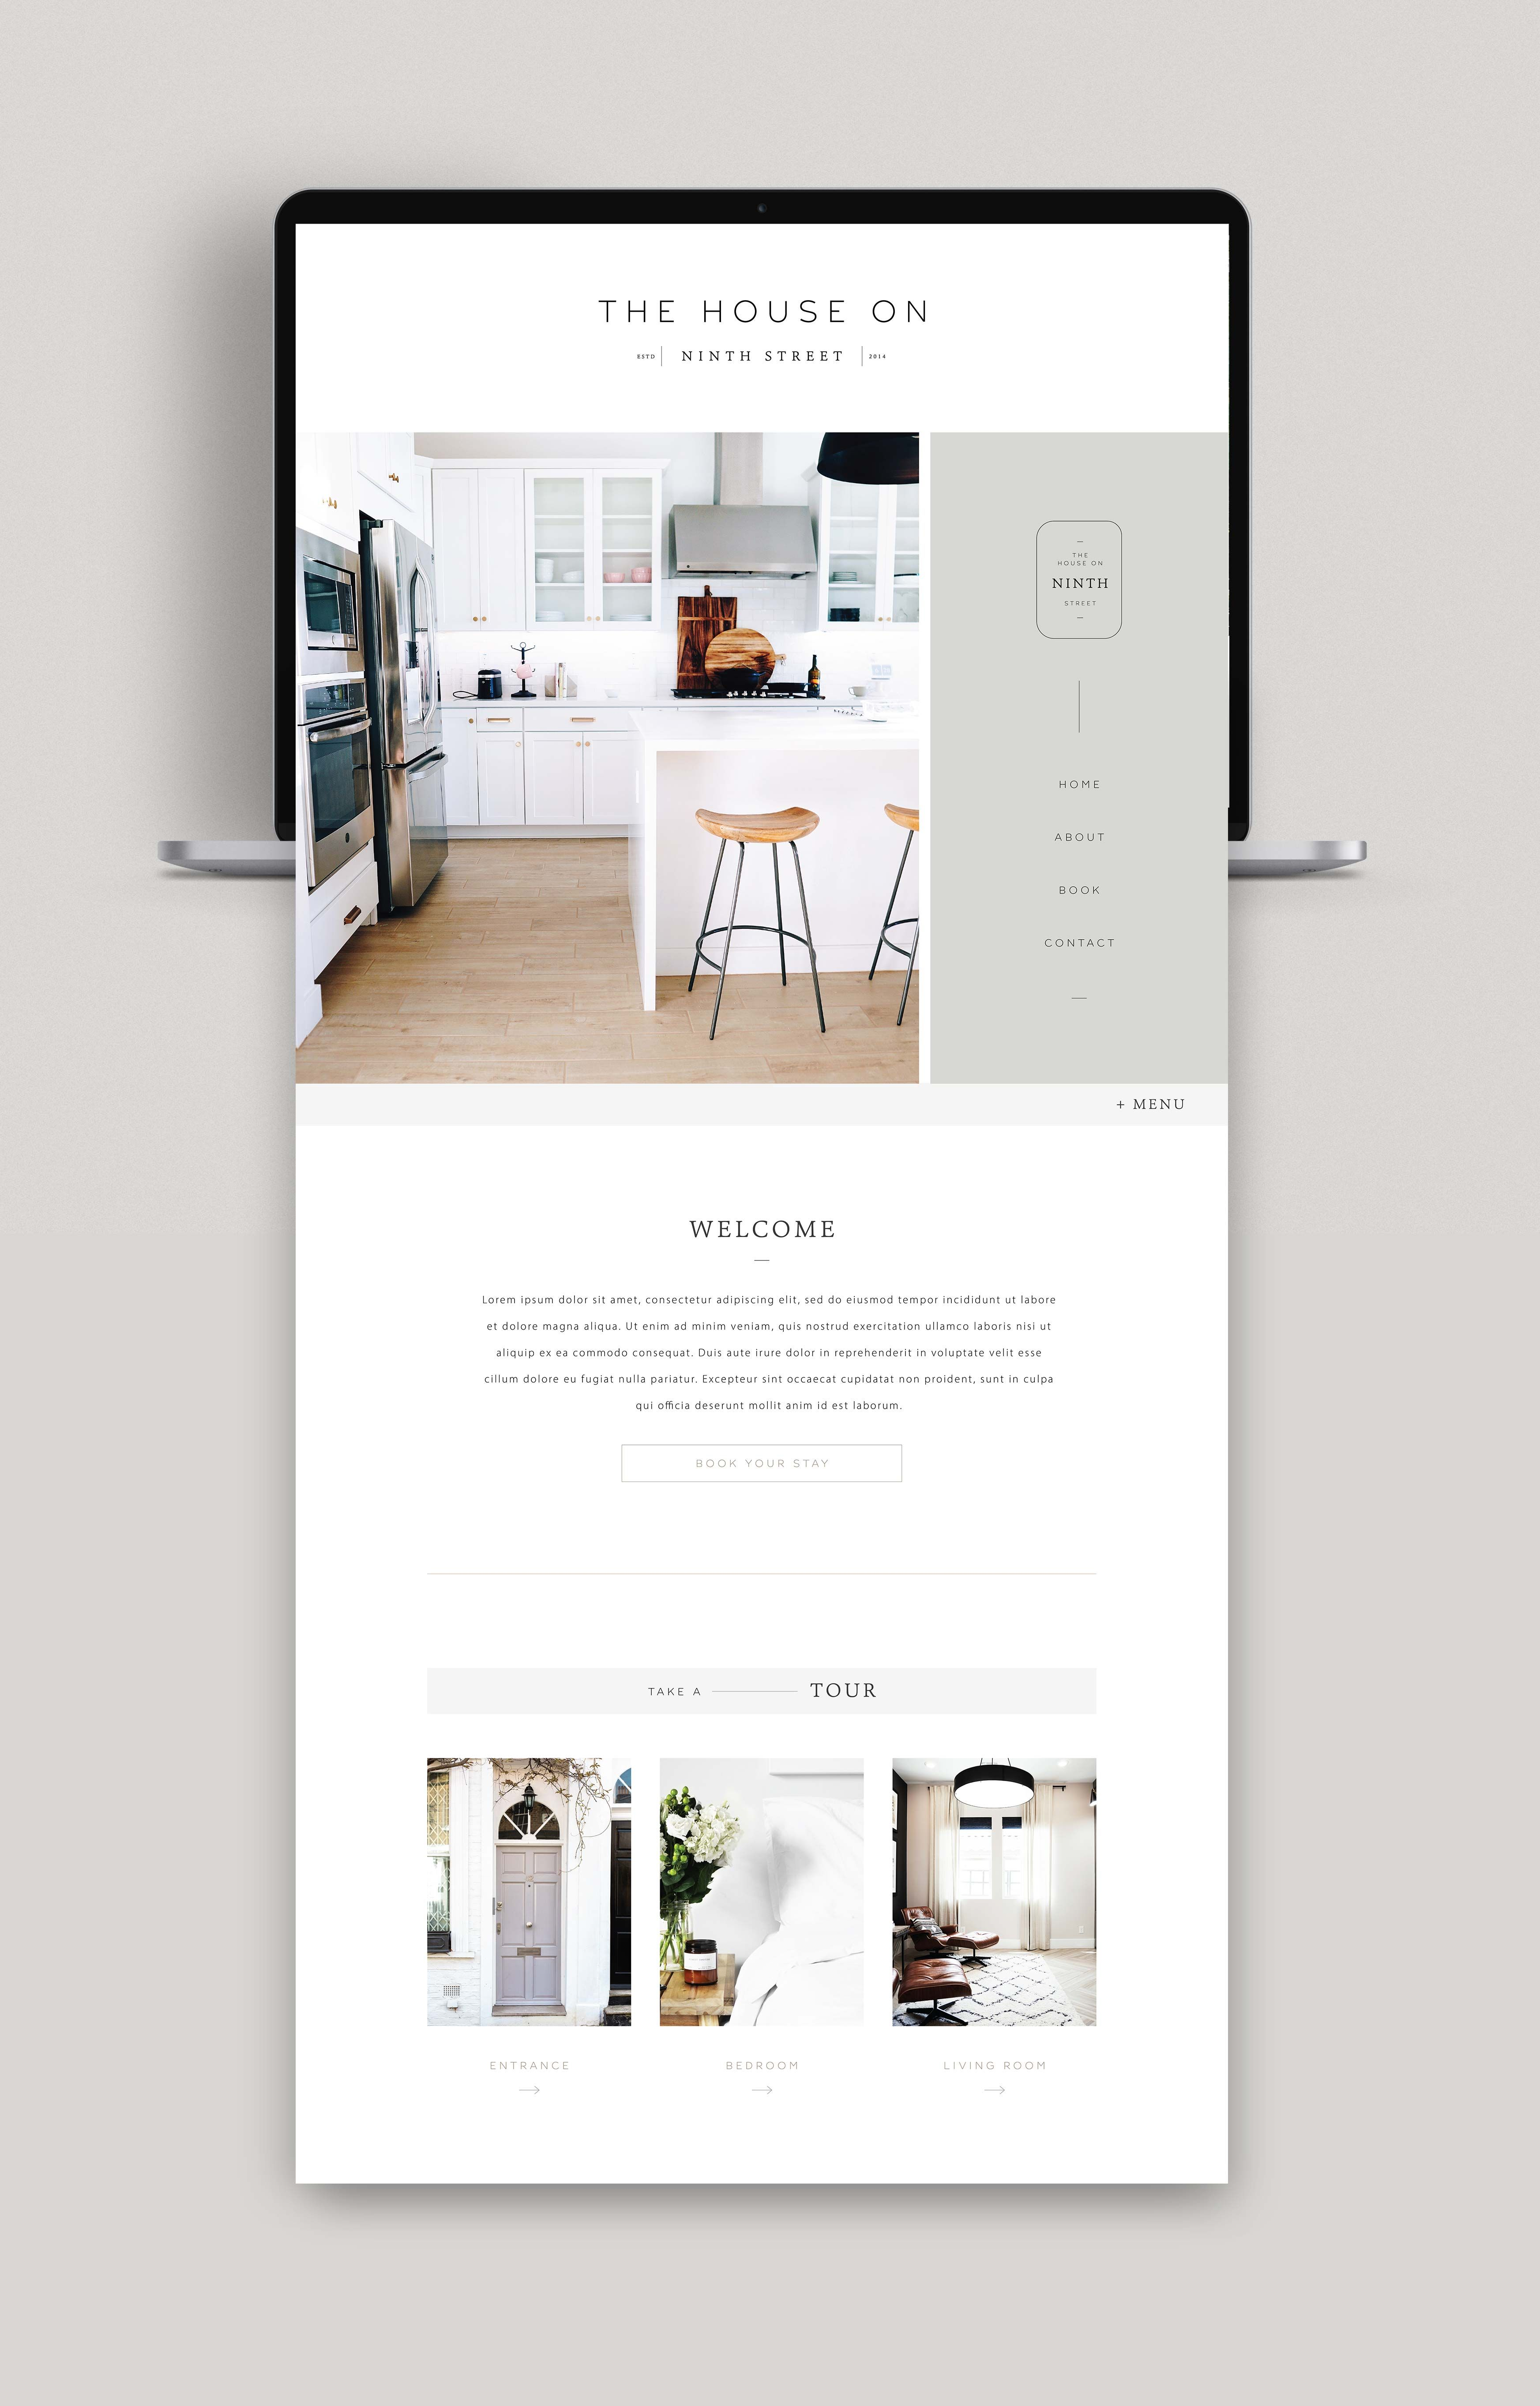 Minimal Modern Design Inspiration Branding And Website Ideas Amarie Lael Design In 2020 Simple Web Design Modern Web Design Minimalist Web Design